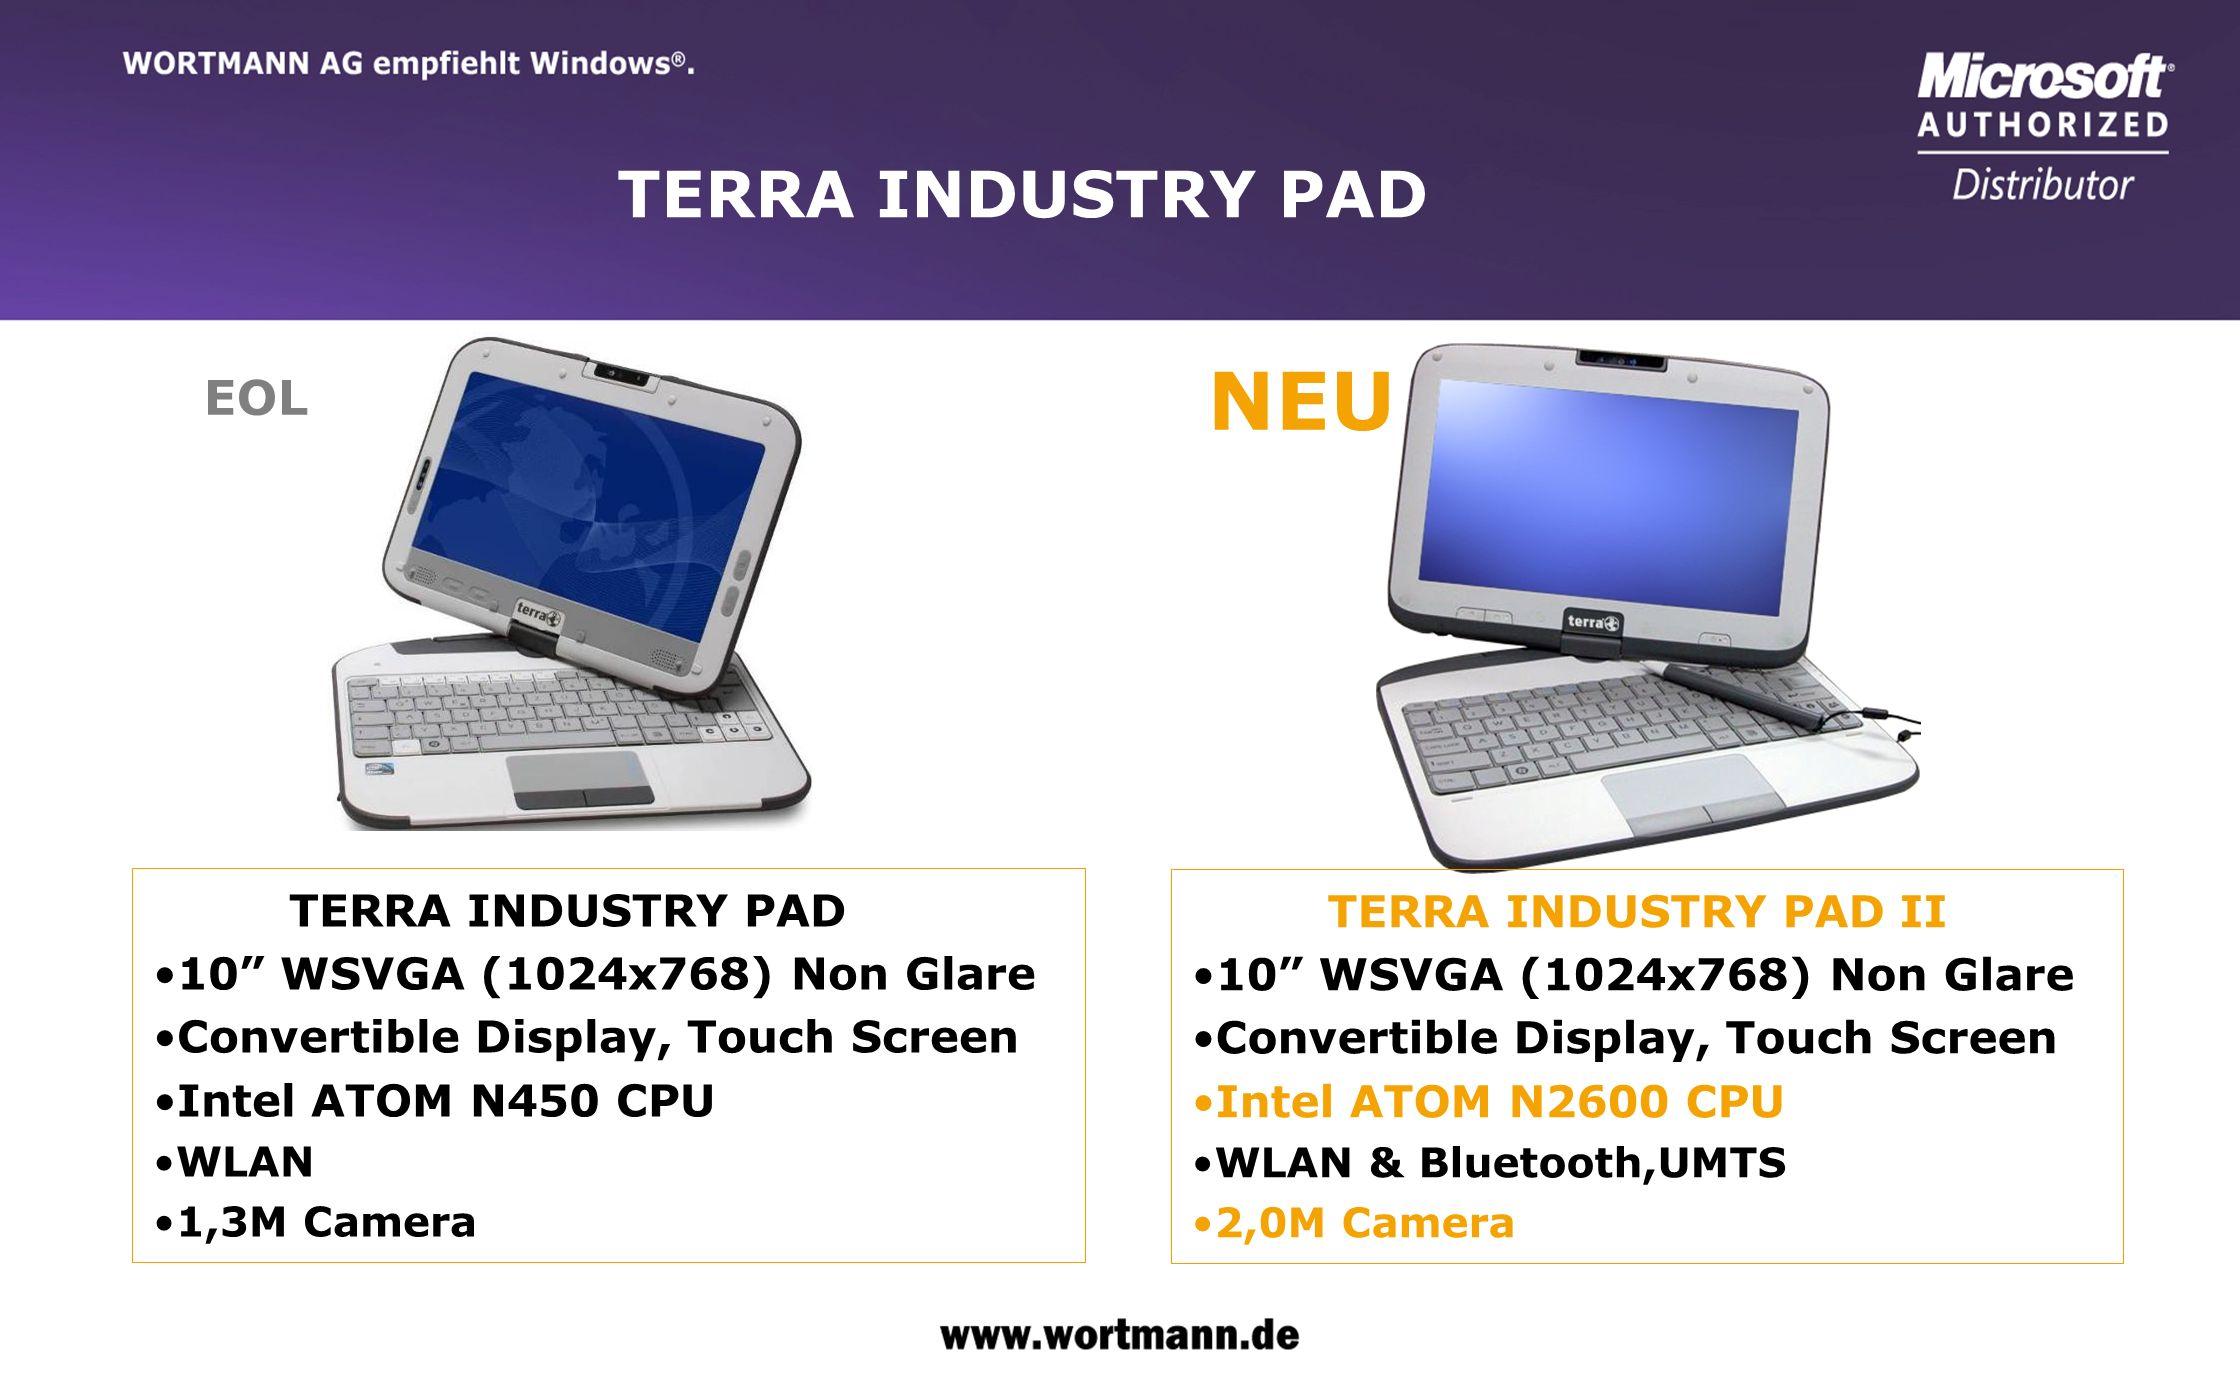 www.wortmann.de TERRA MOBILE 1529 – Stylishes ULTRA-LIKE Notebook mit super Preis/Leistungverhältnis 15,6 HD LED Non Glare Intel HM77 Chipsatz Intel GMA 4000 integrierte Grafik Ultra Slim ODD, 9,5mm Intel WLAN, Webcam, Bluetooth HDMI, VGA, LAN 2x USB3.0 (1x Powered USB),2x USB2.0 UMTS vorbereitet WOL (Wake On Lan) S5 Lange Akkulaufzeit (62,16Wh bis 5 Stunden) Nur 14-25,4mm dick 2,2KG schwer ab Okt..